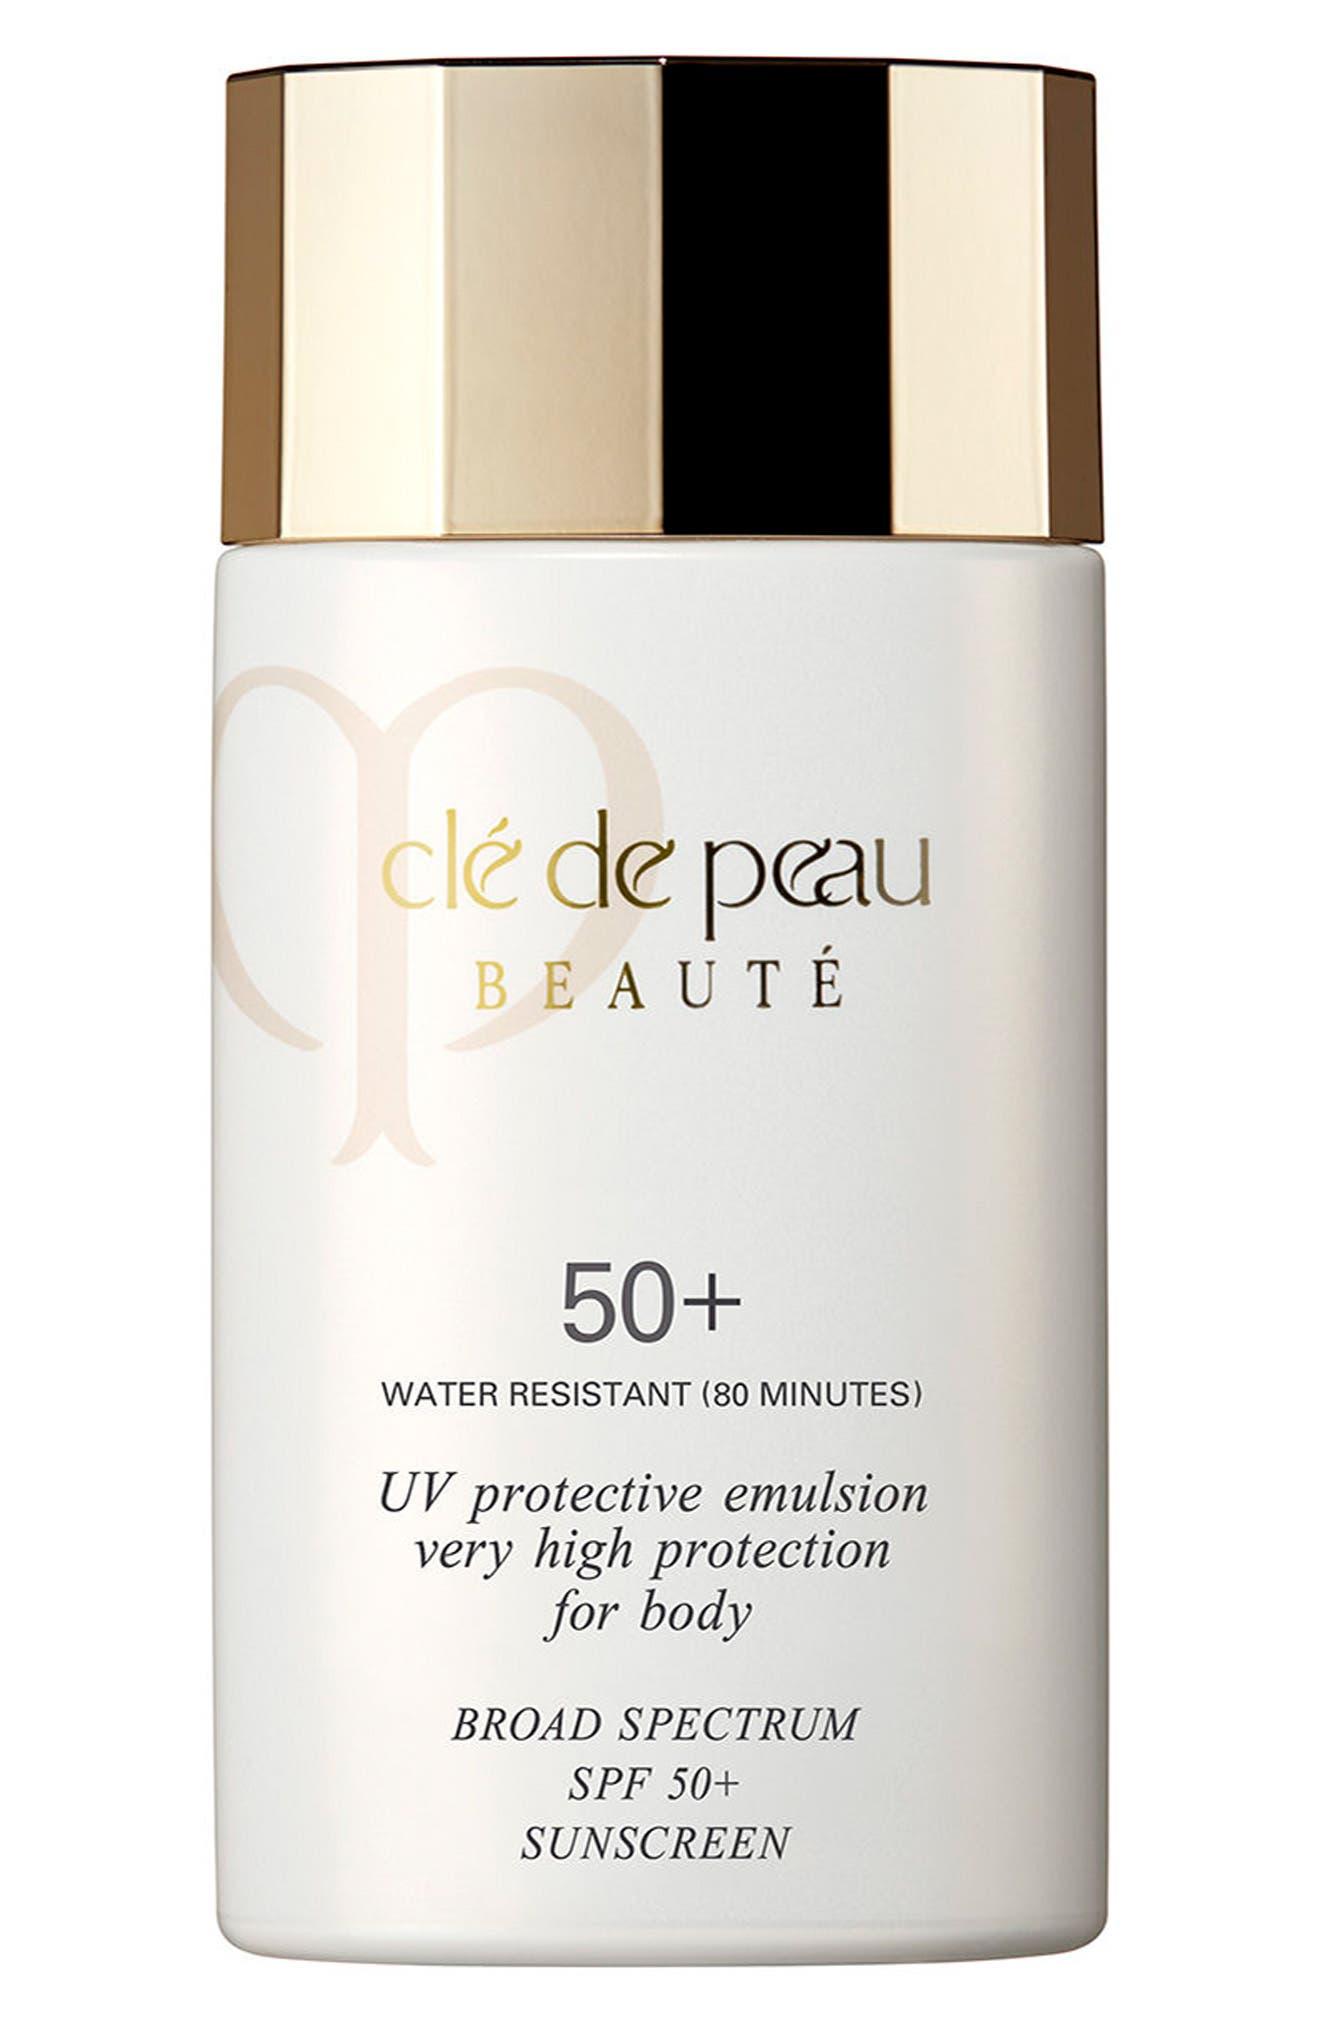 Clé de Peau Beauté UV Protective Emulsion Very High Protection for Body Broad Spectrum SPF 50+